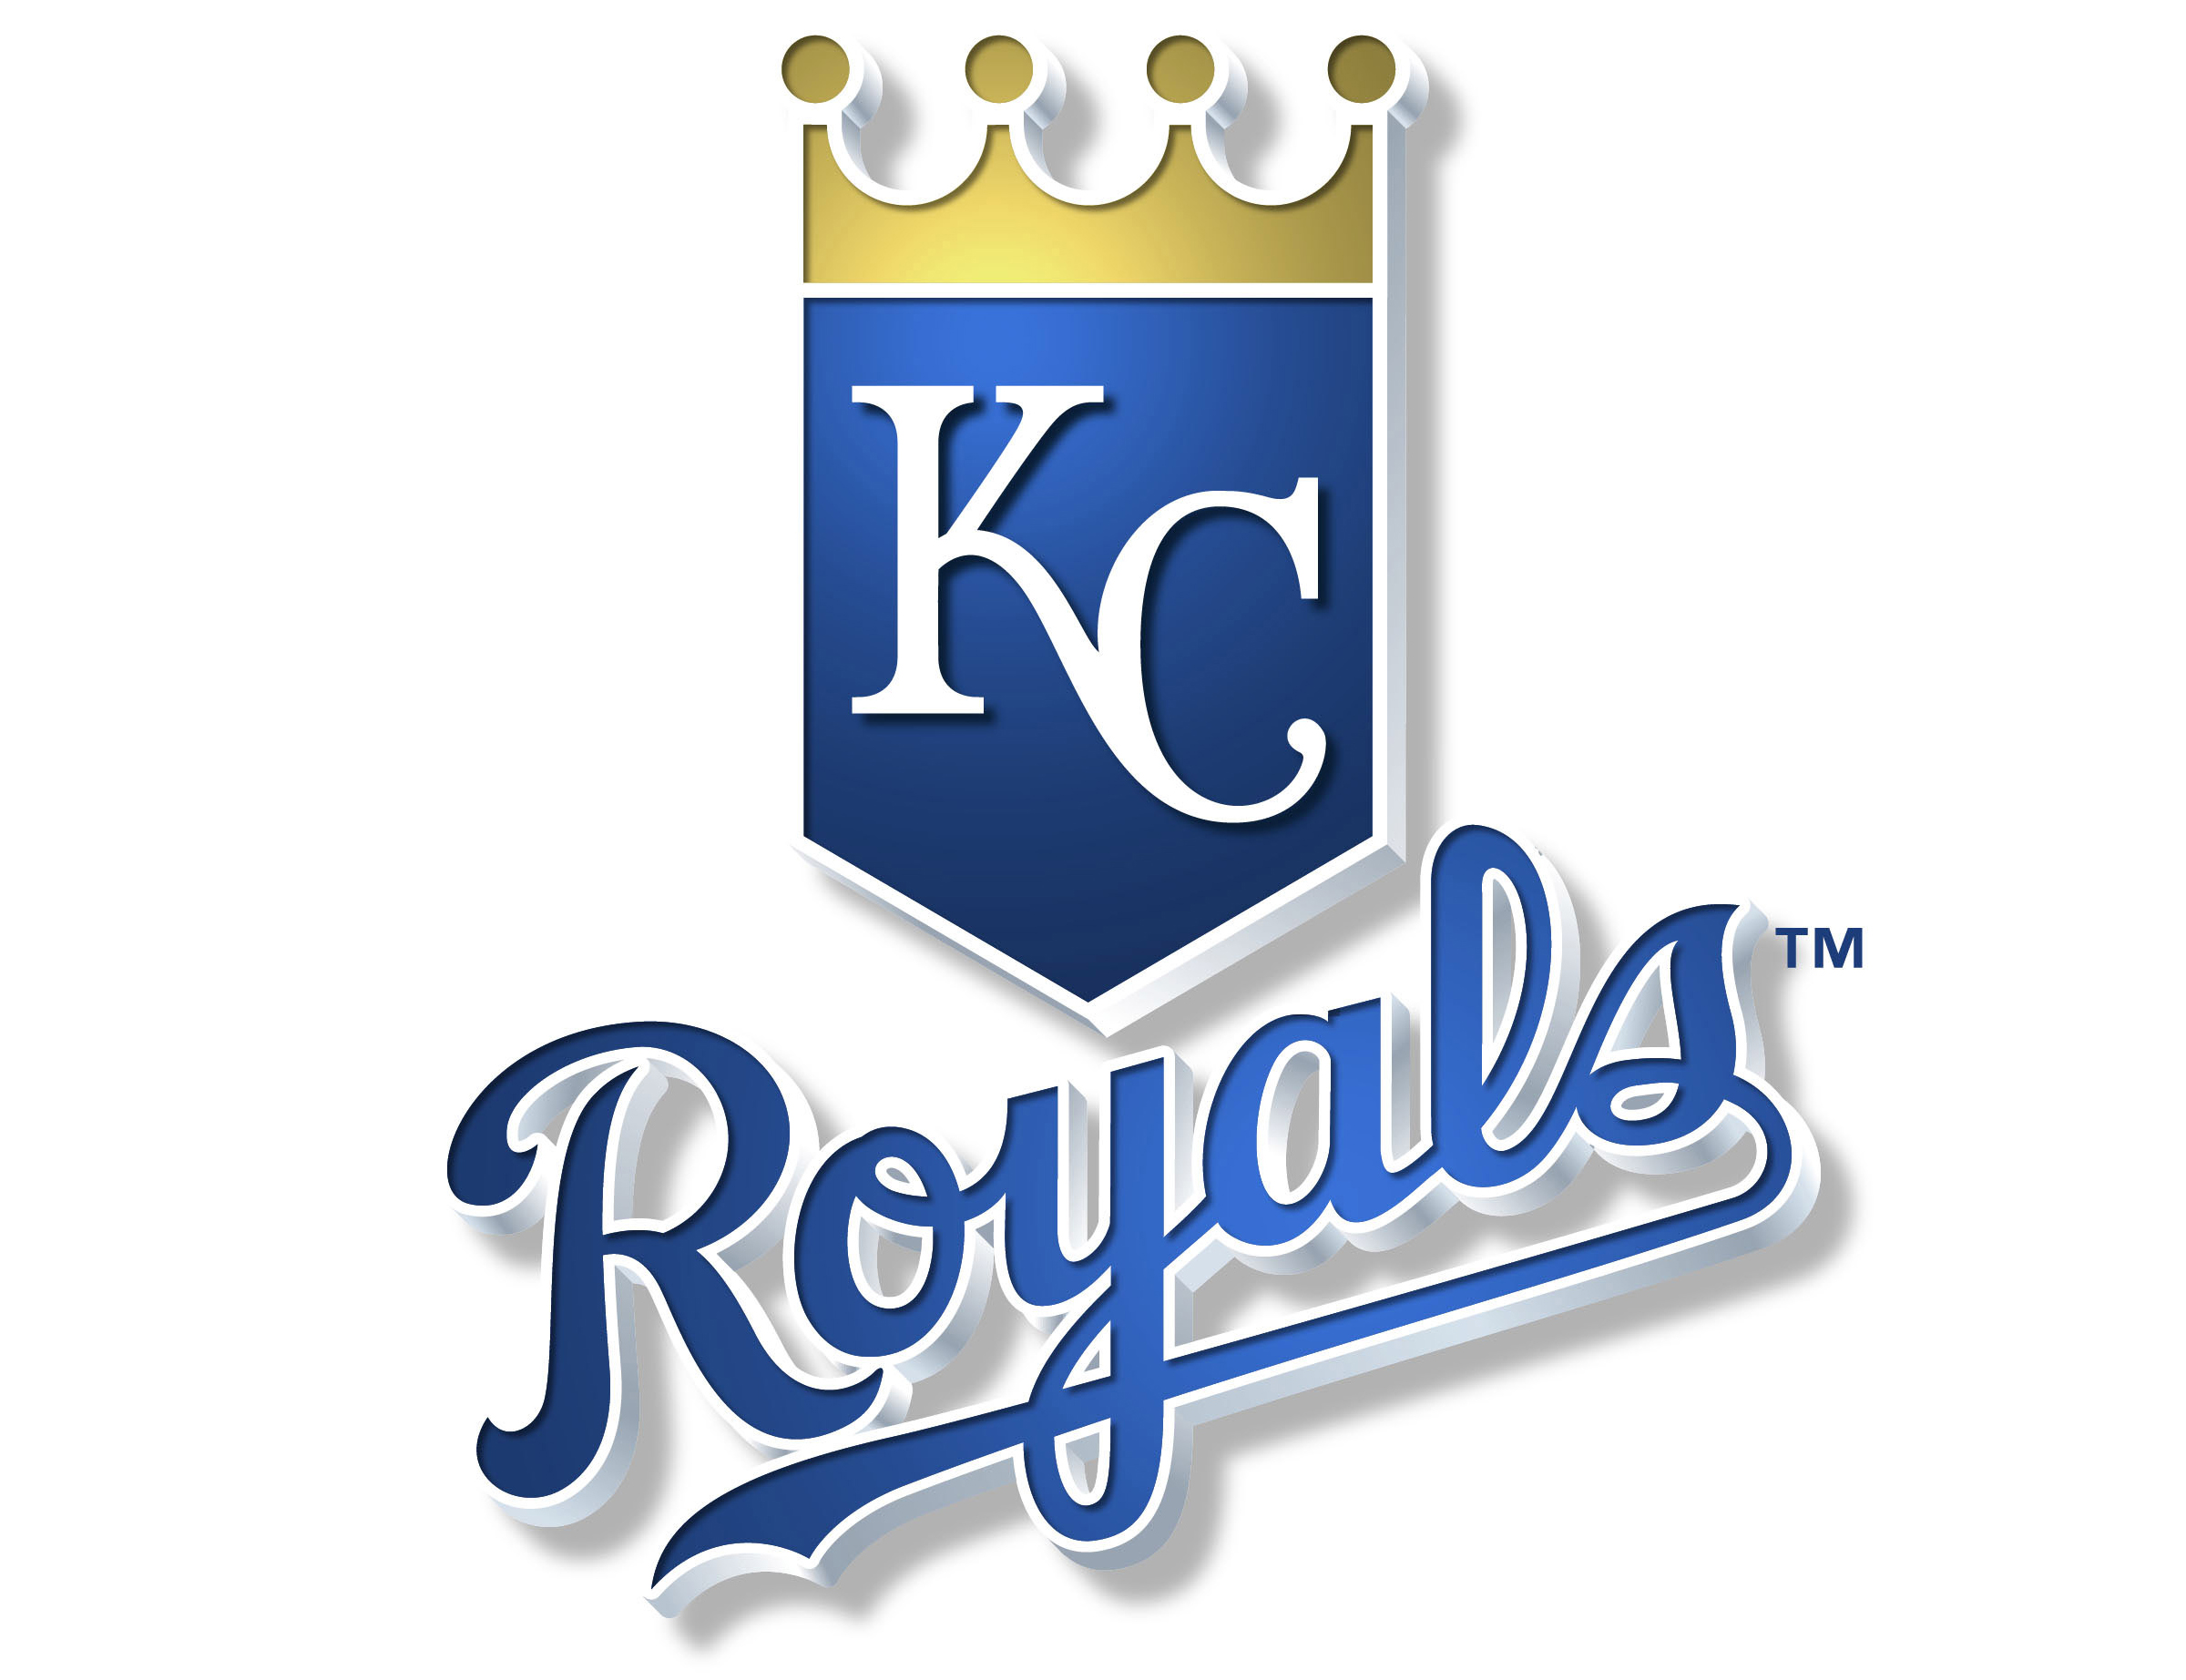 Meaning Kansas City Royals logo and symbol.